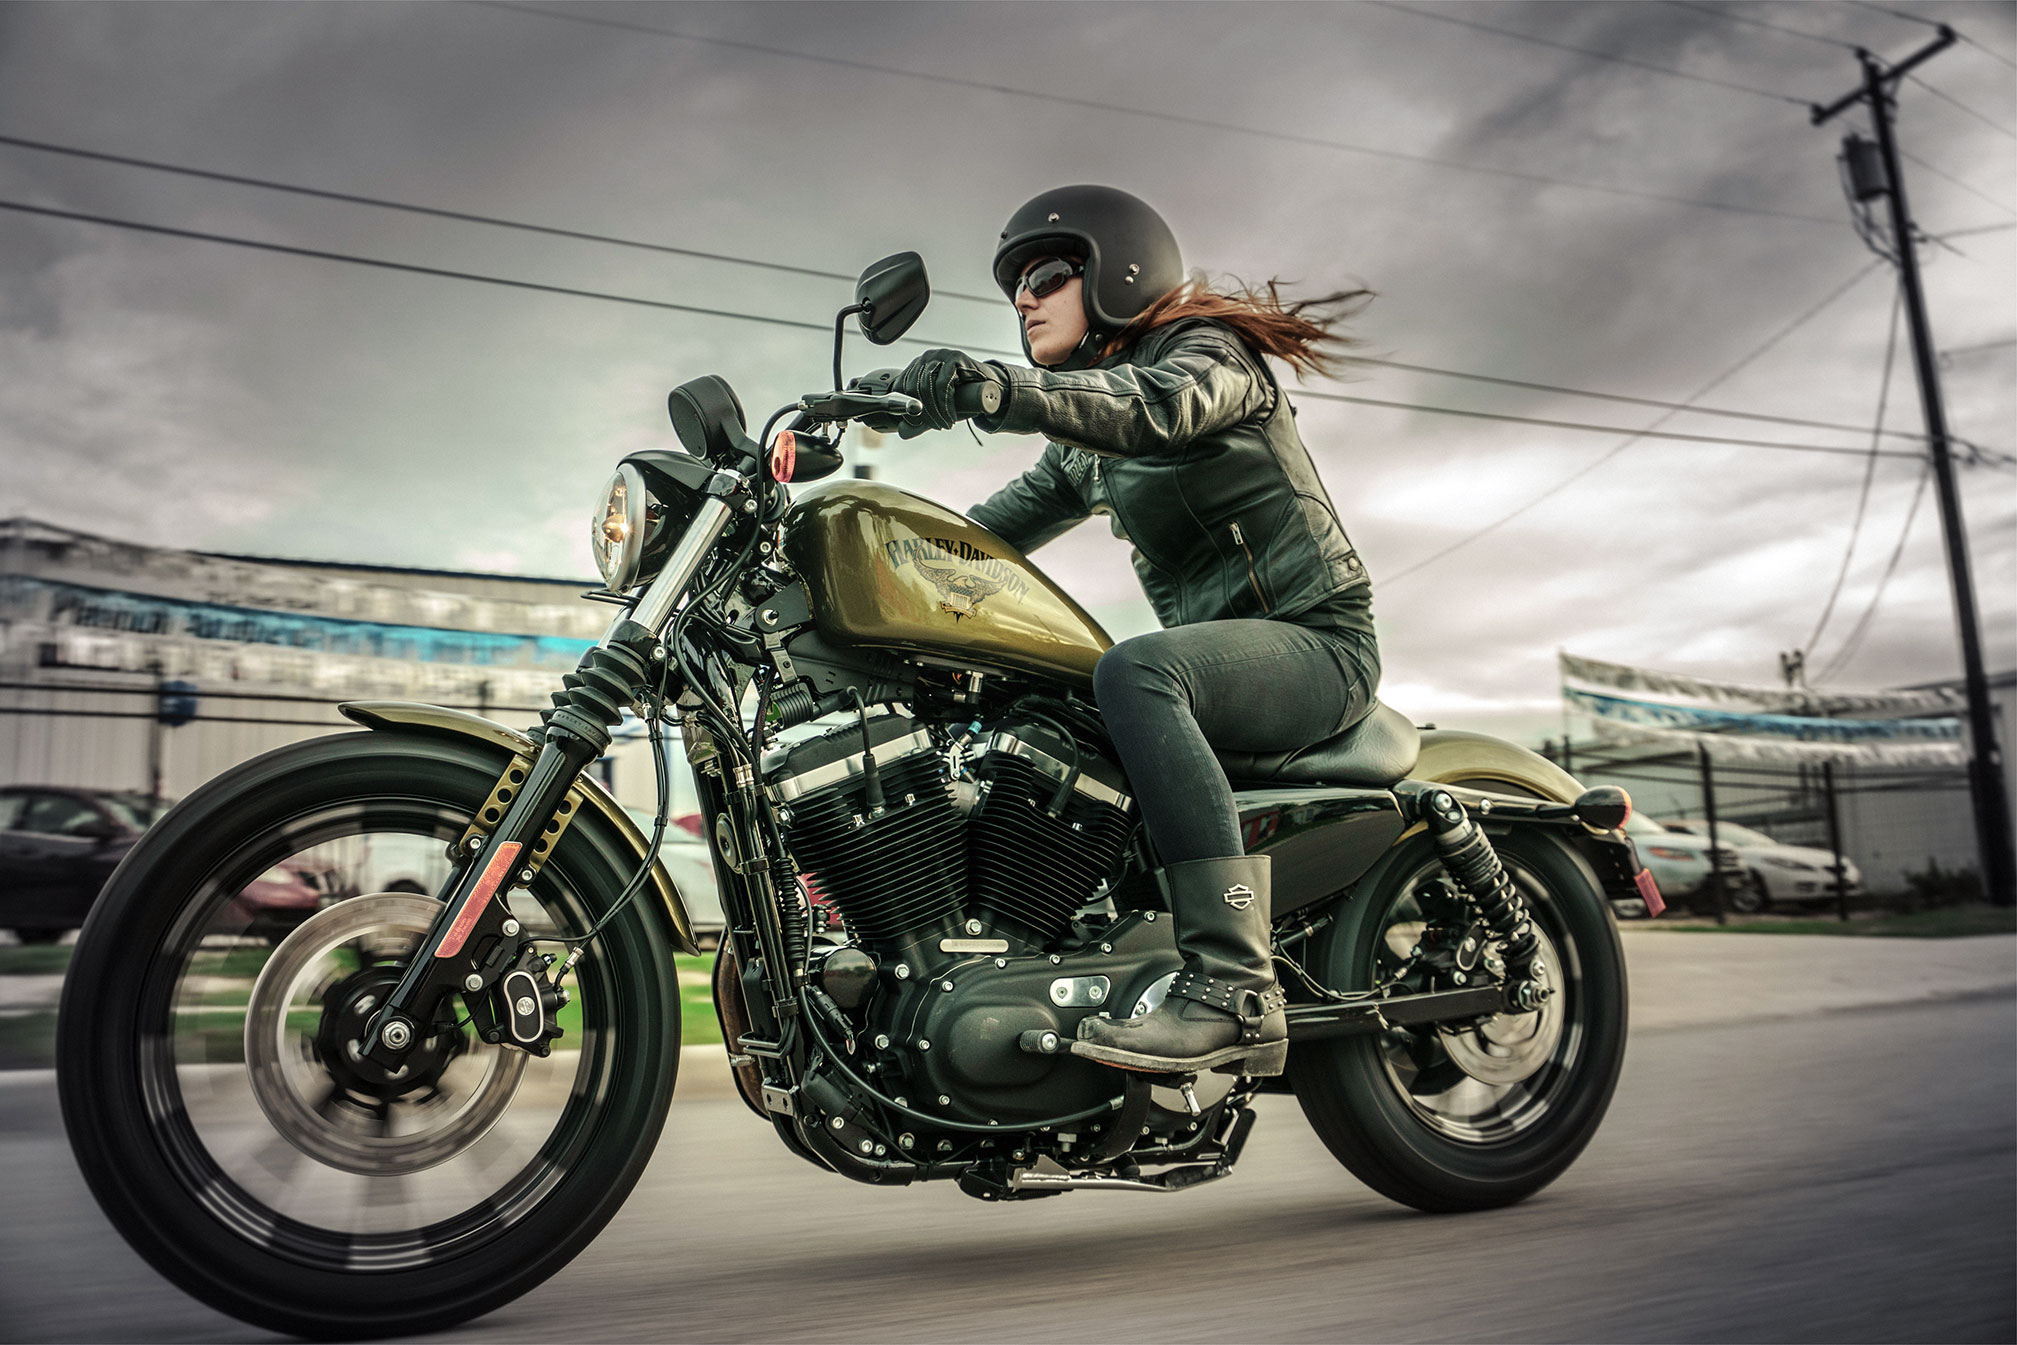 2017 Harley Davidson Iron 883 Hd Wallpaper Background Image